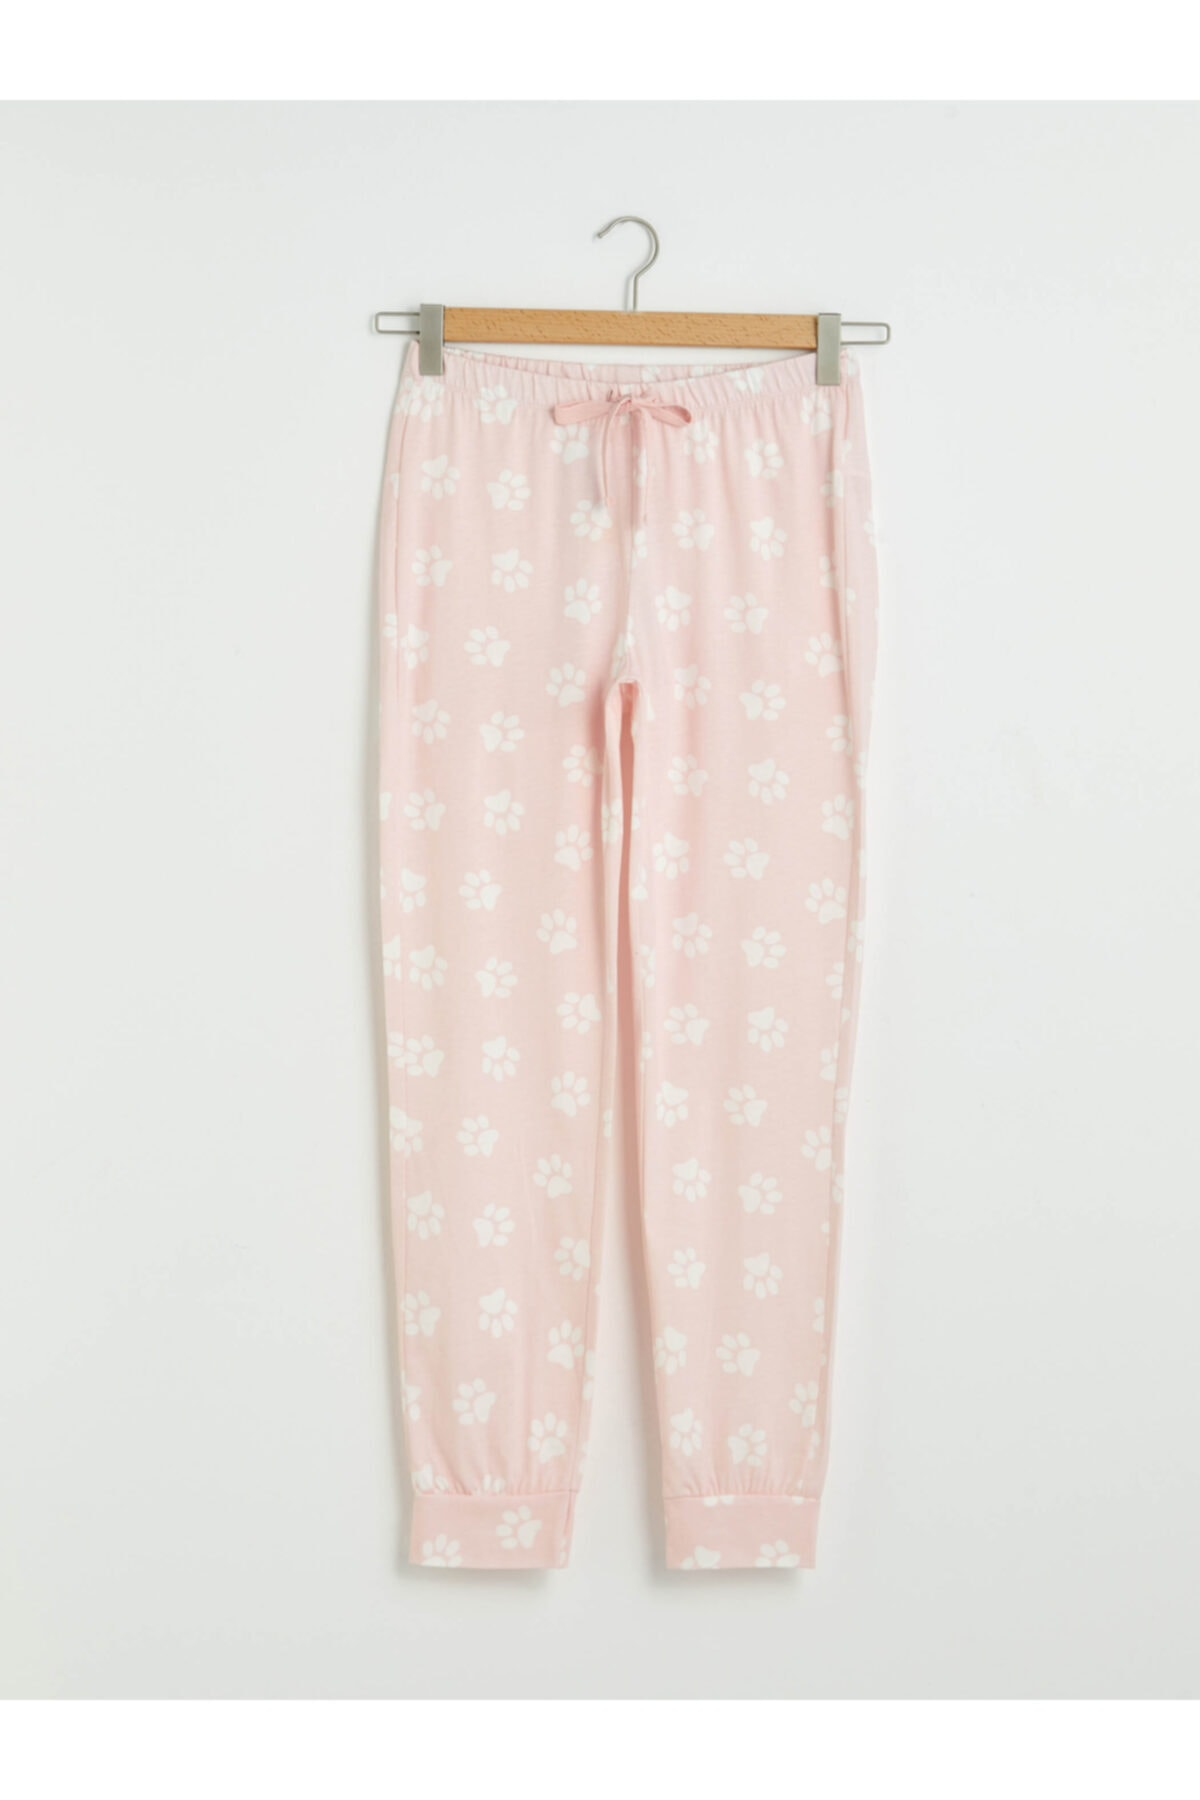 LC Waikiki Kadın Pembe Pijama Altı 1